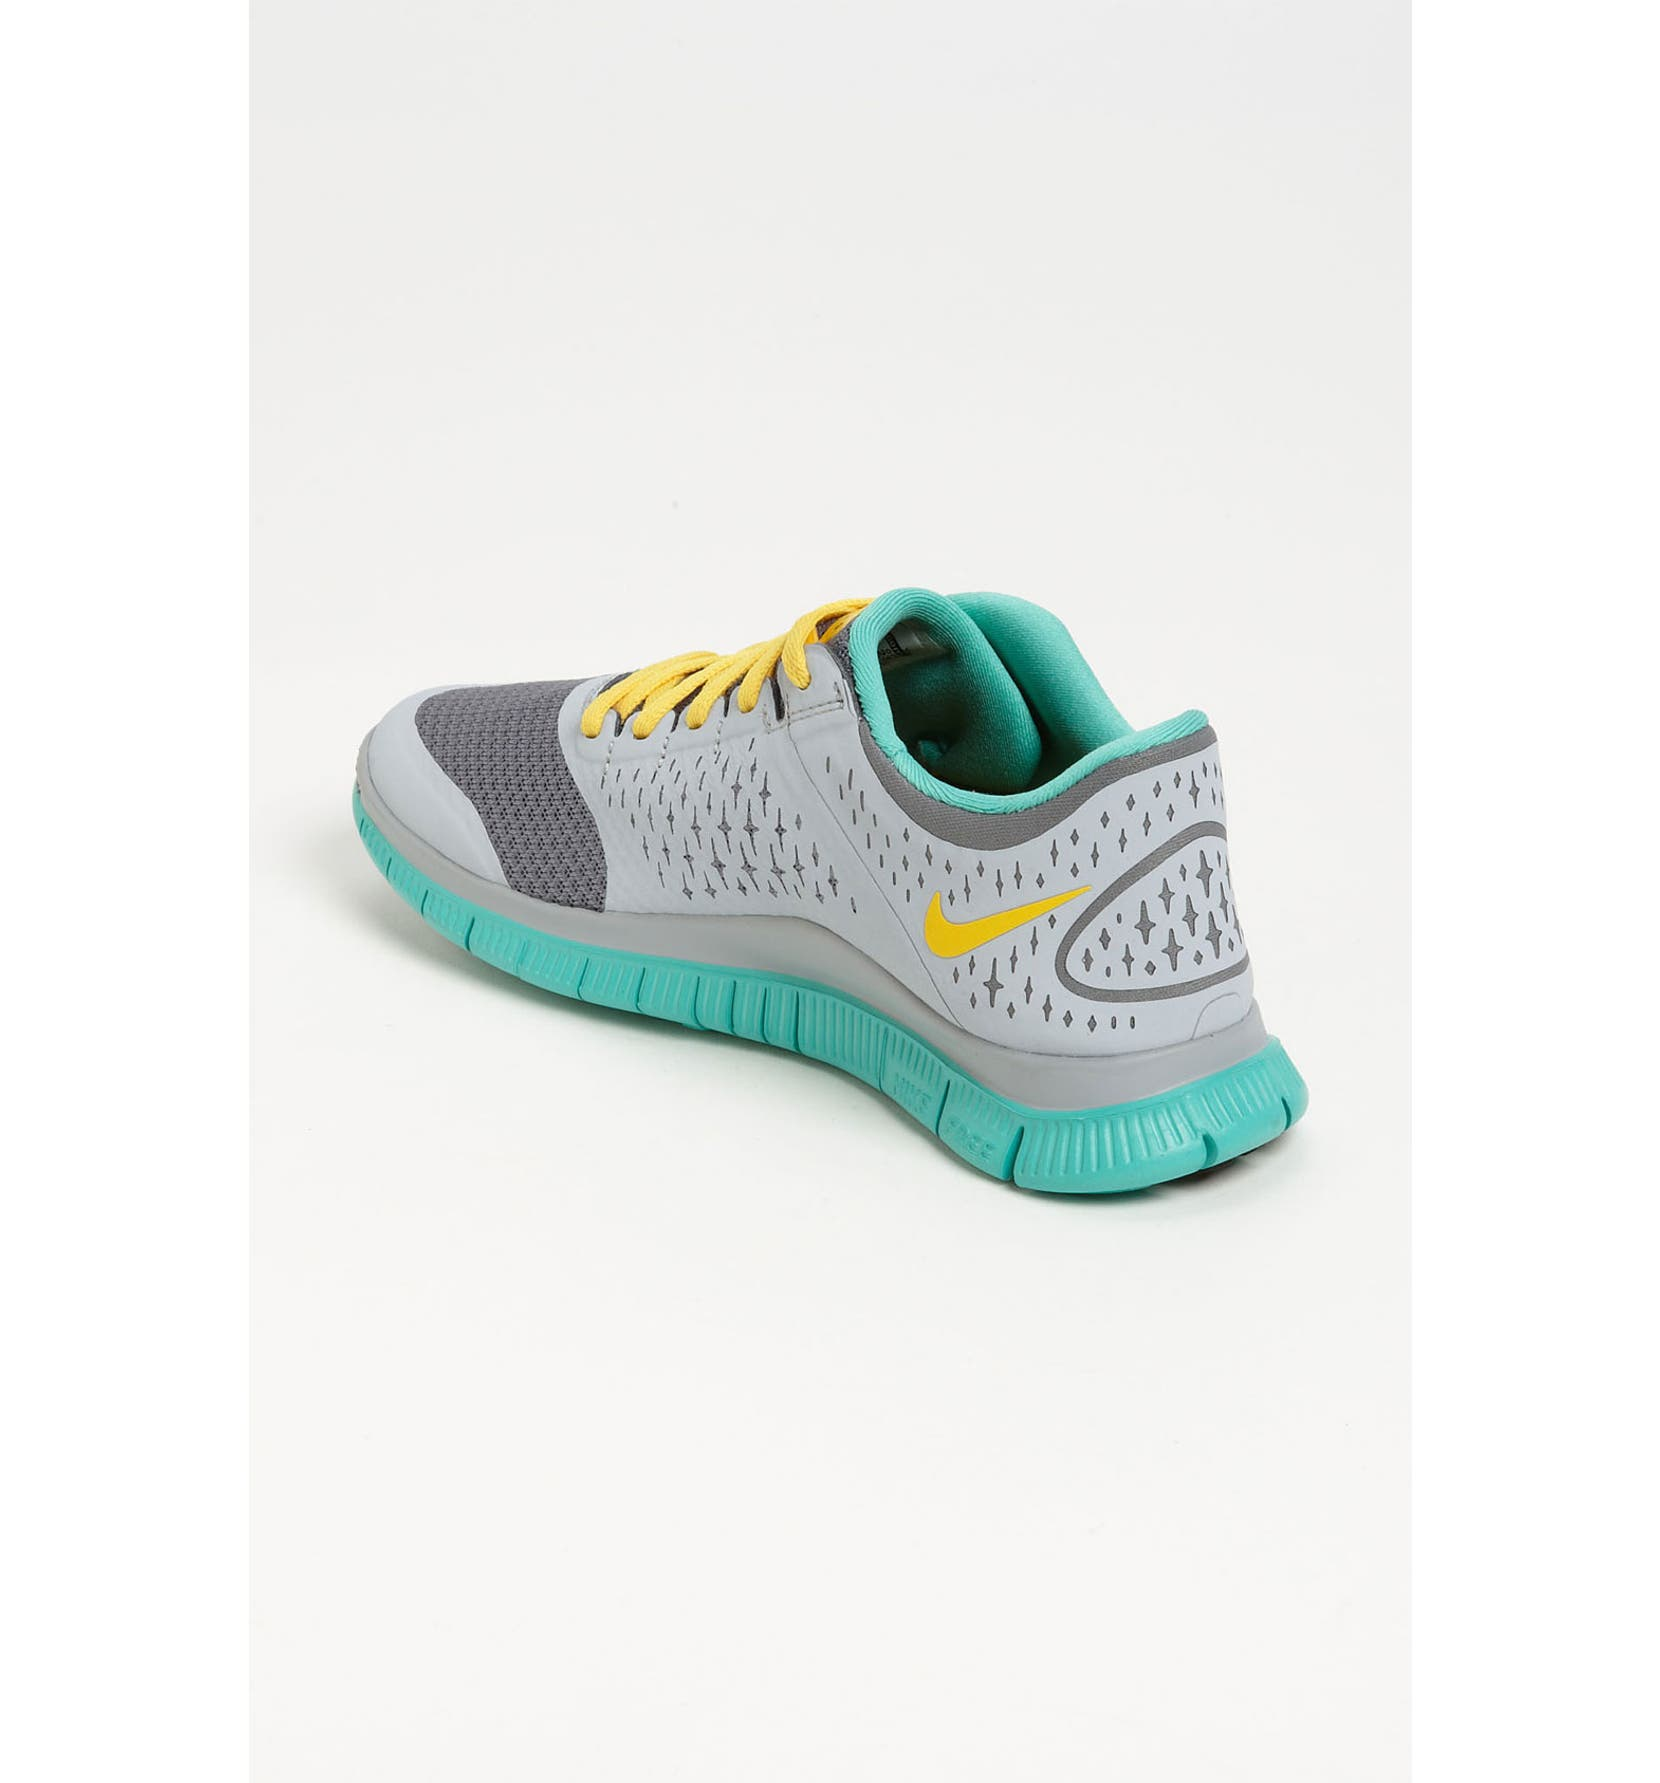 6871b9b1ad2 ... Nike Free 4.0 V2 Livestrong Running Shoe (Women) Nordstrom ...